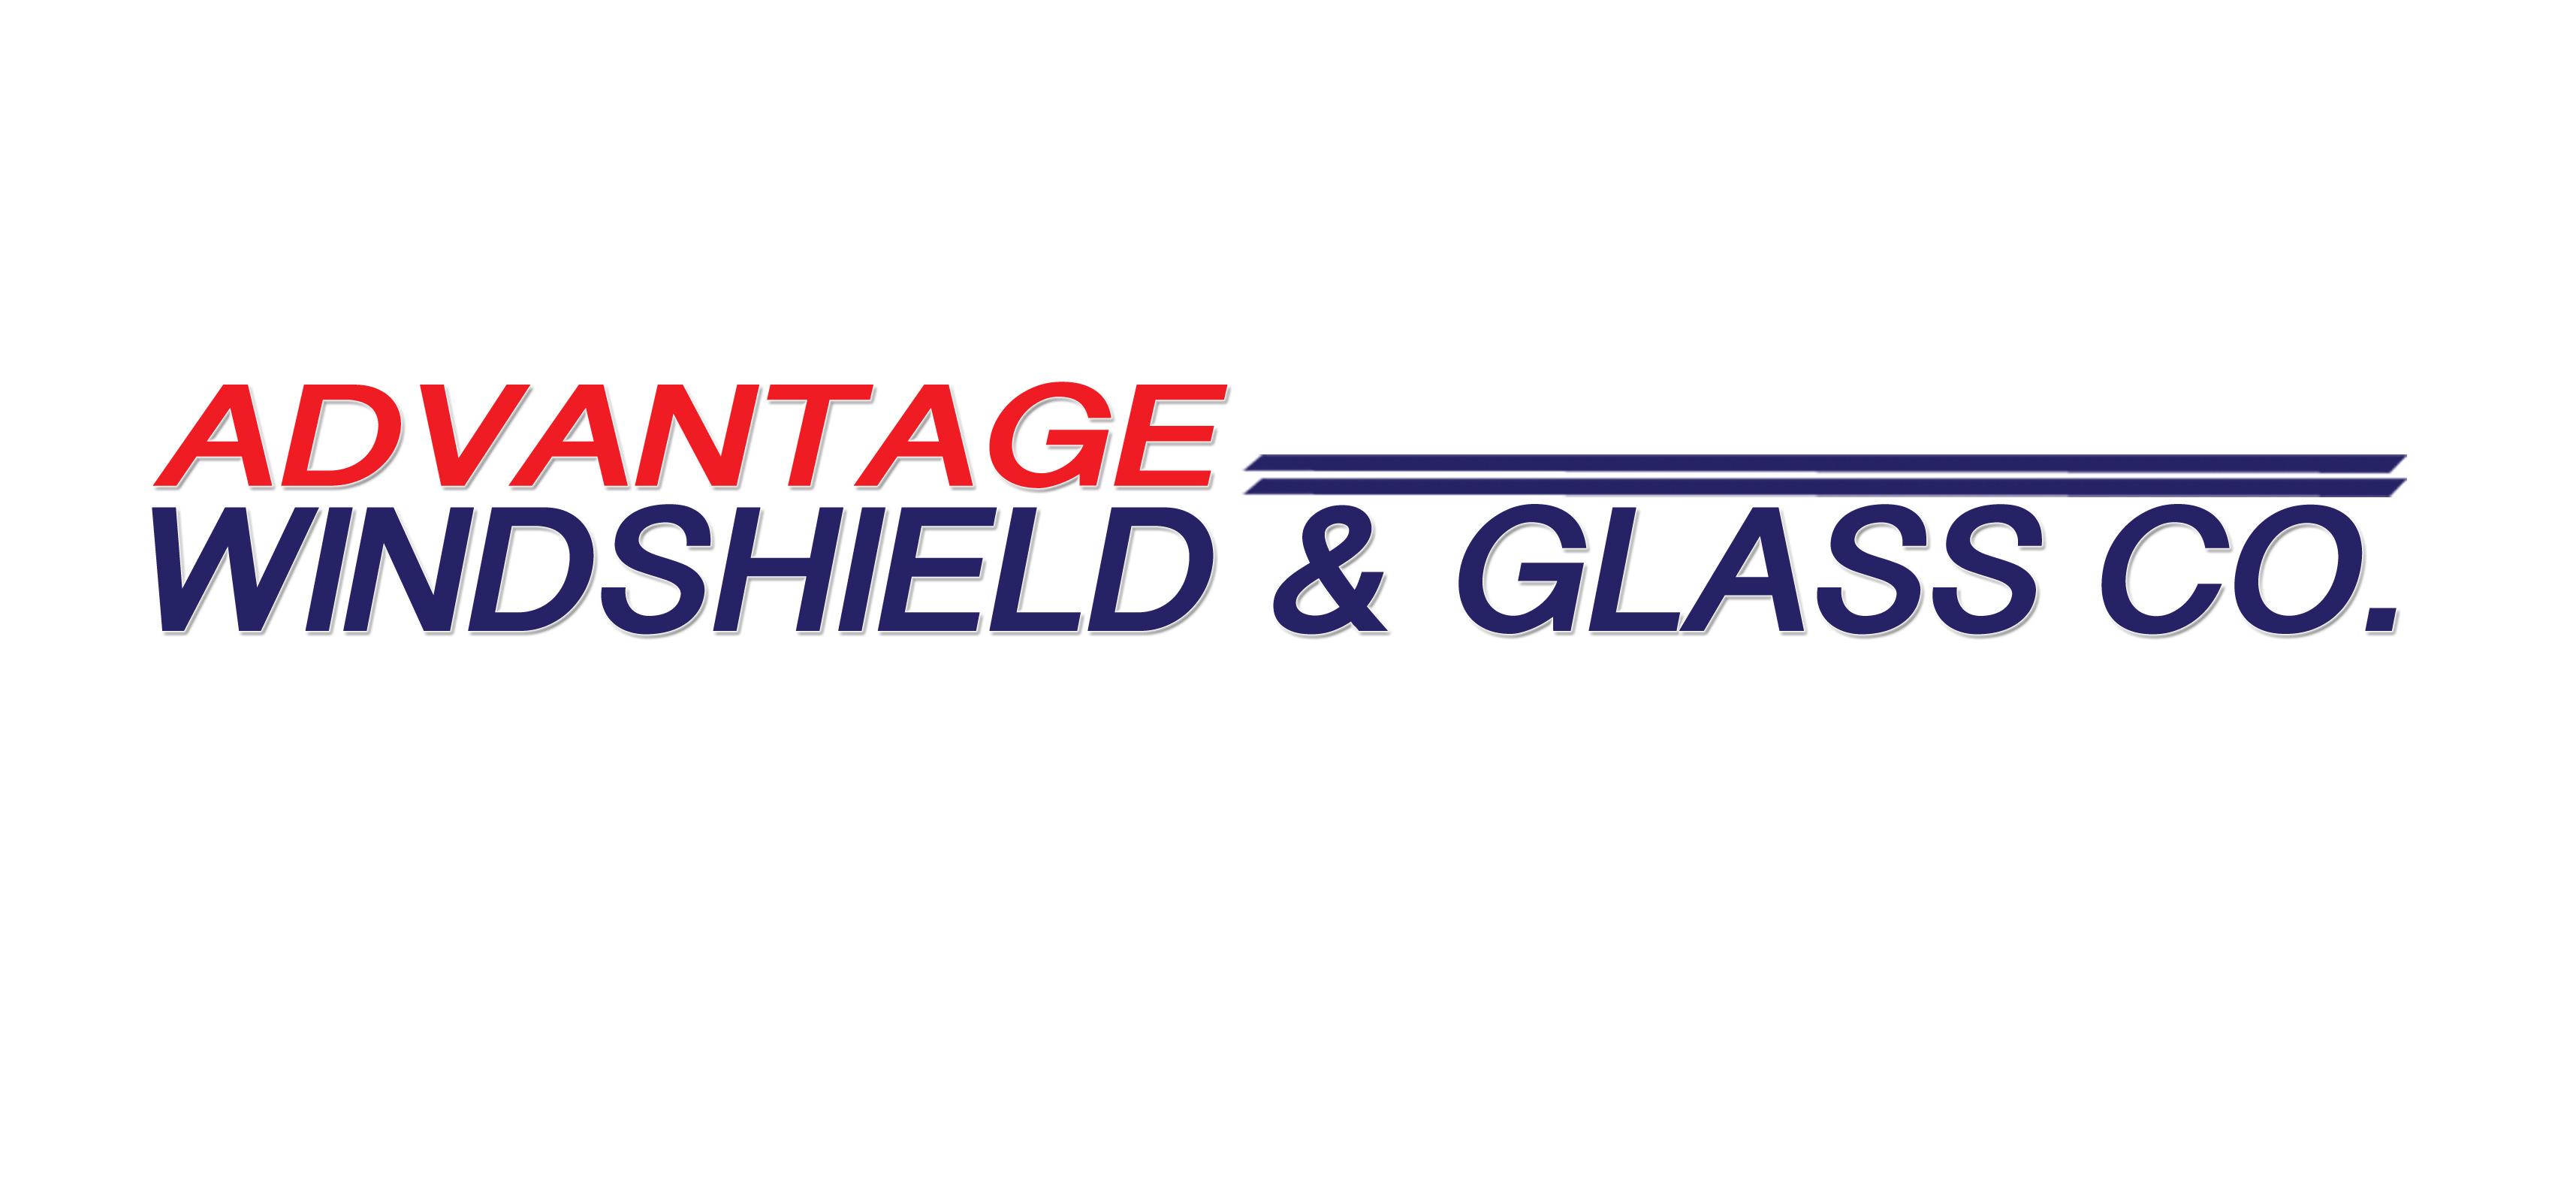 Advantage Windshield & Glass